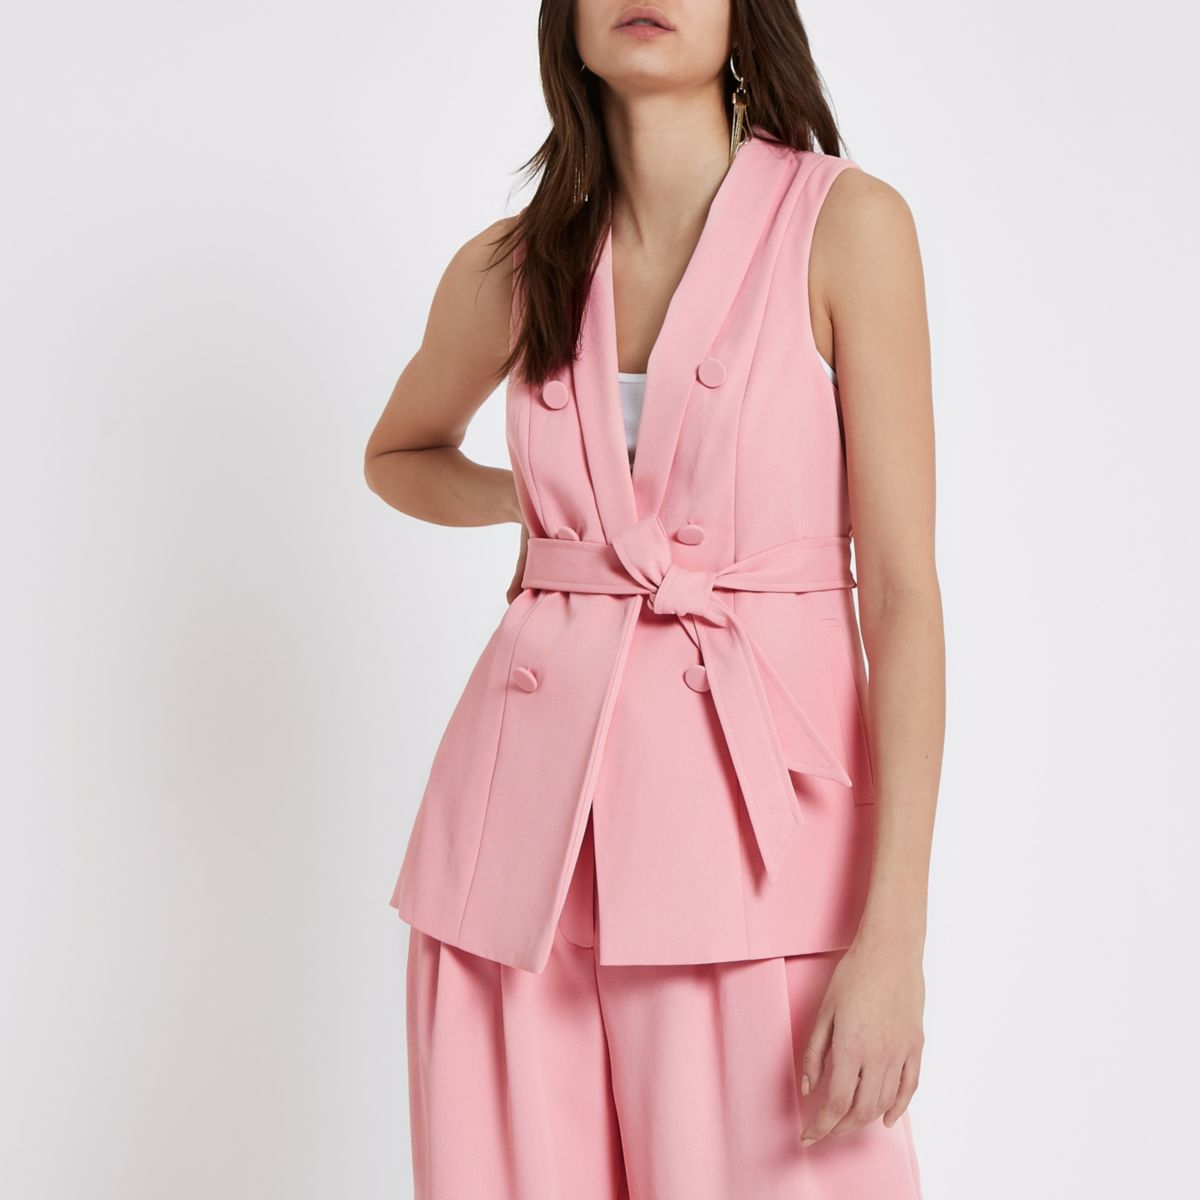 Pink sleeveless double breasted jacket